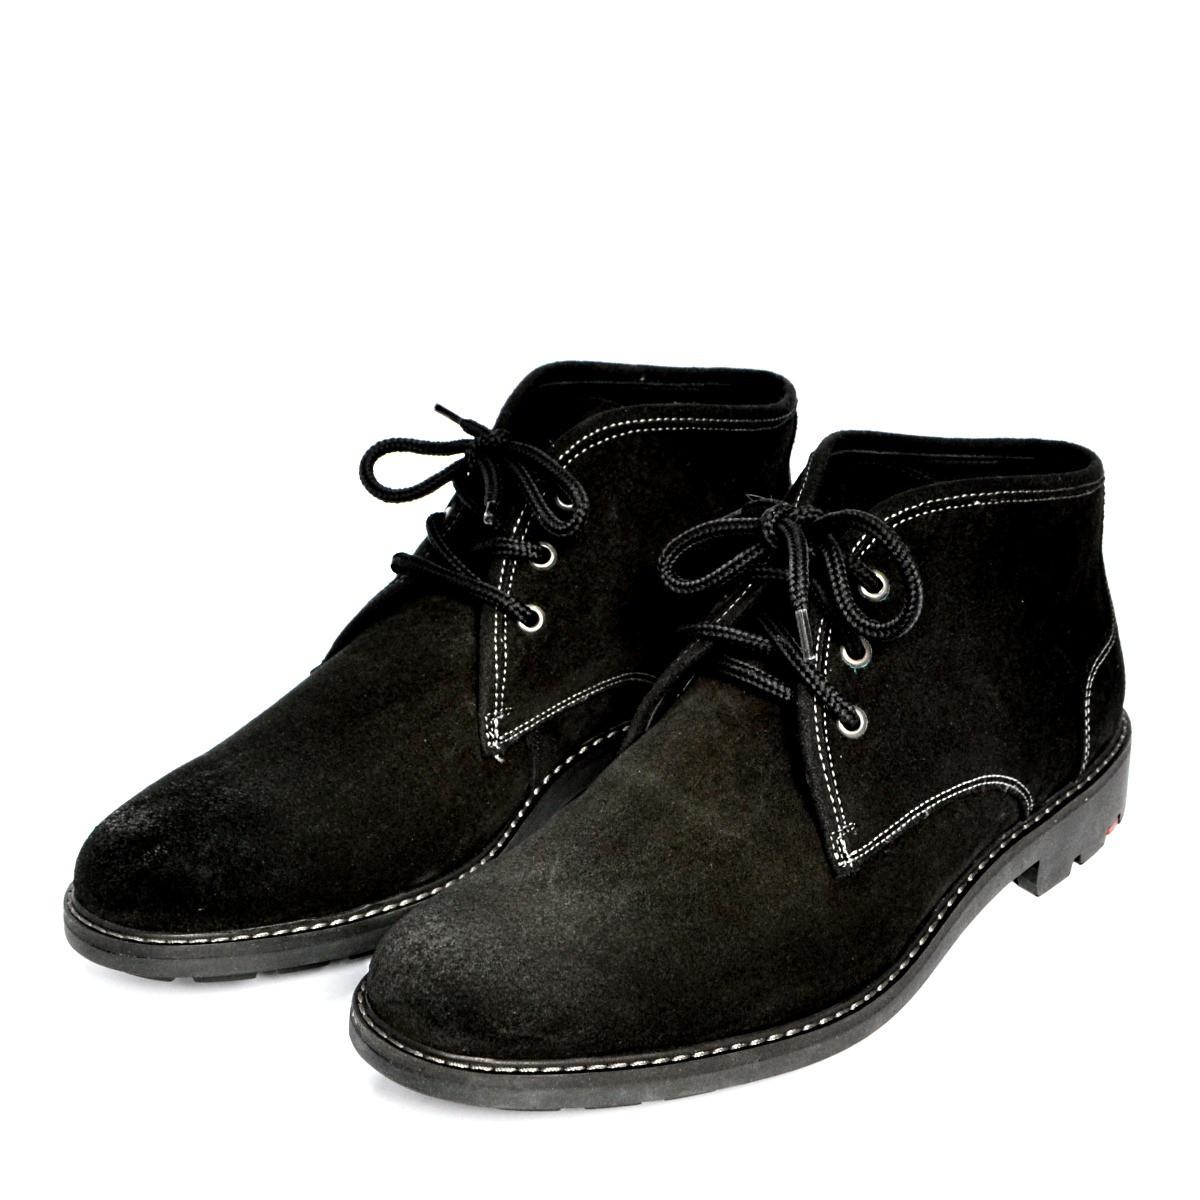 2bfbad05b Ботинки мужские демисезонные кожаные Gerona by Lloyd размер 44.5 -  Интернет-магазин